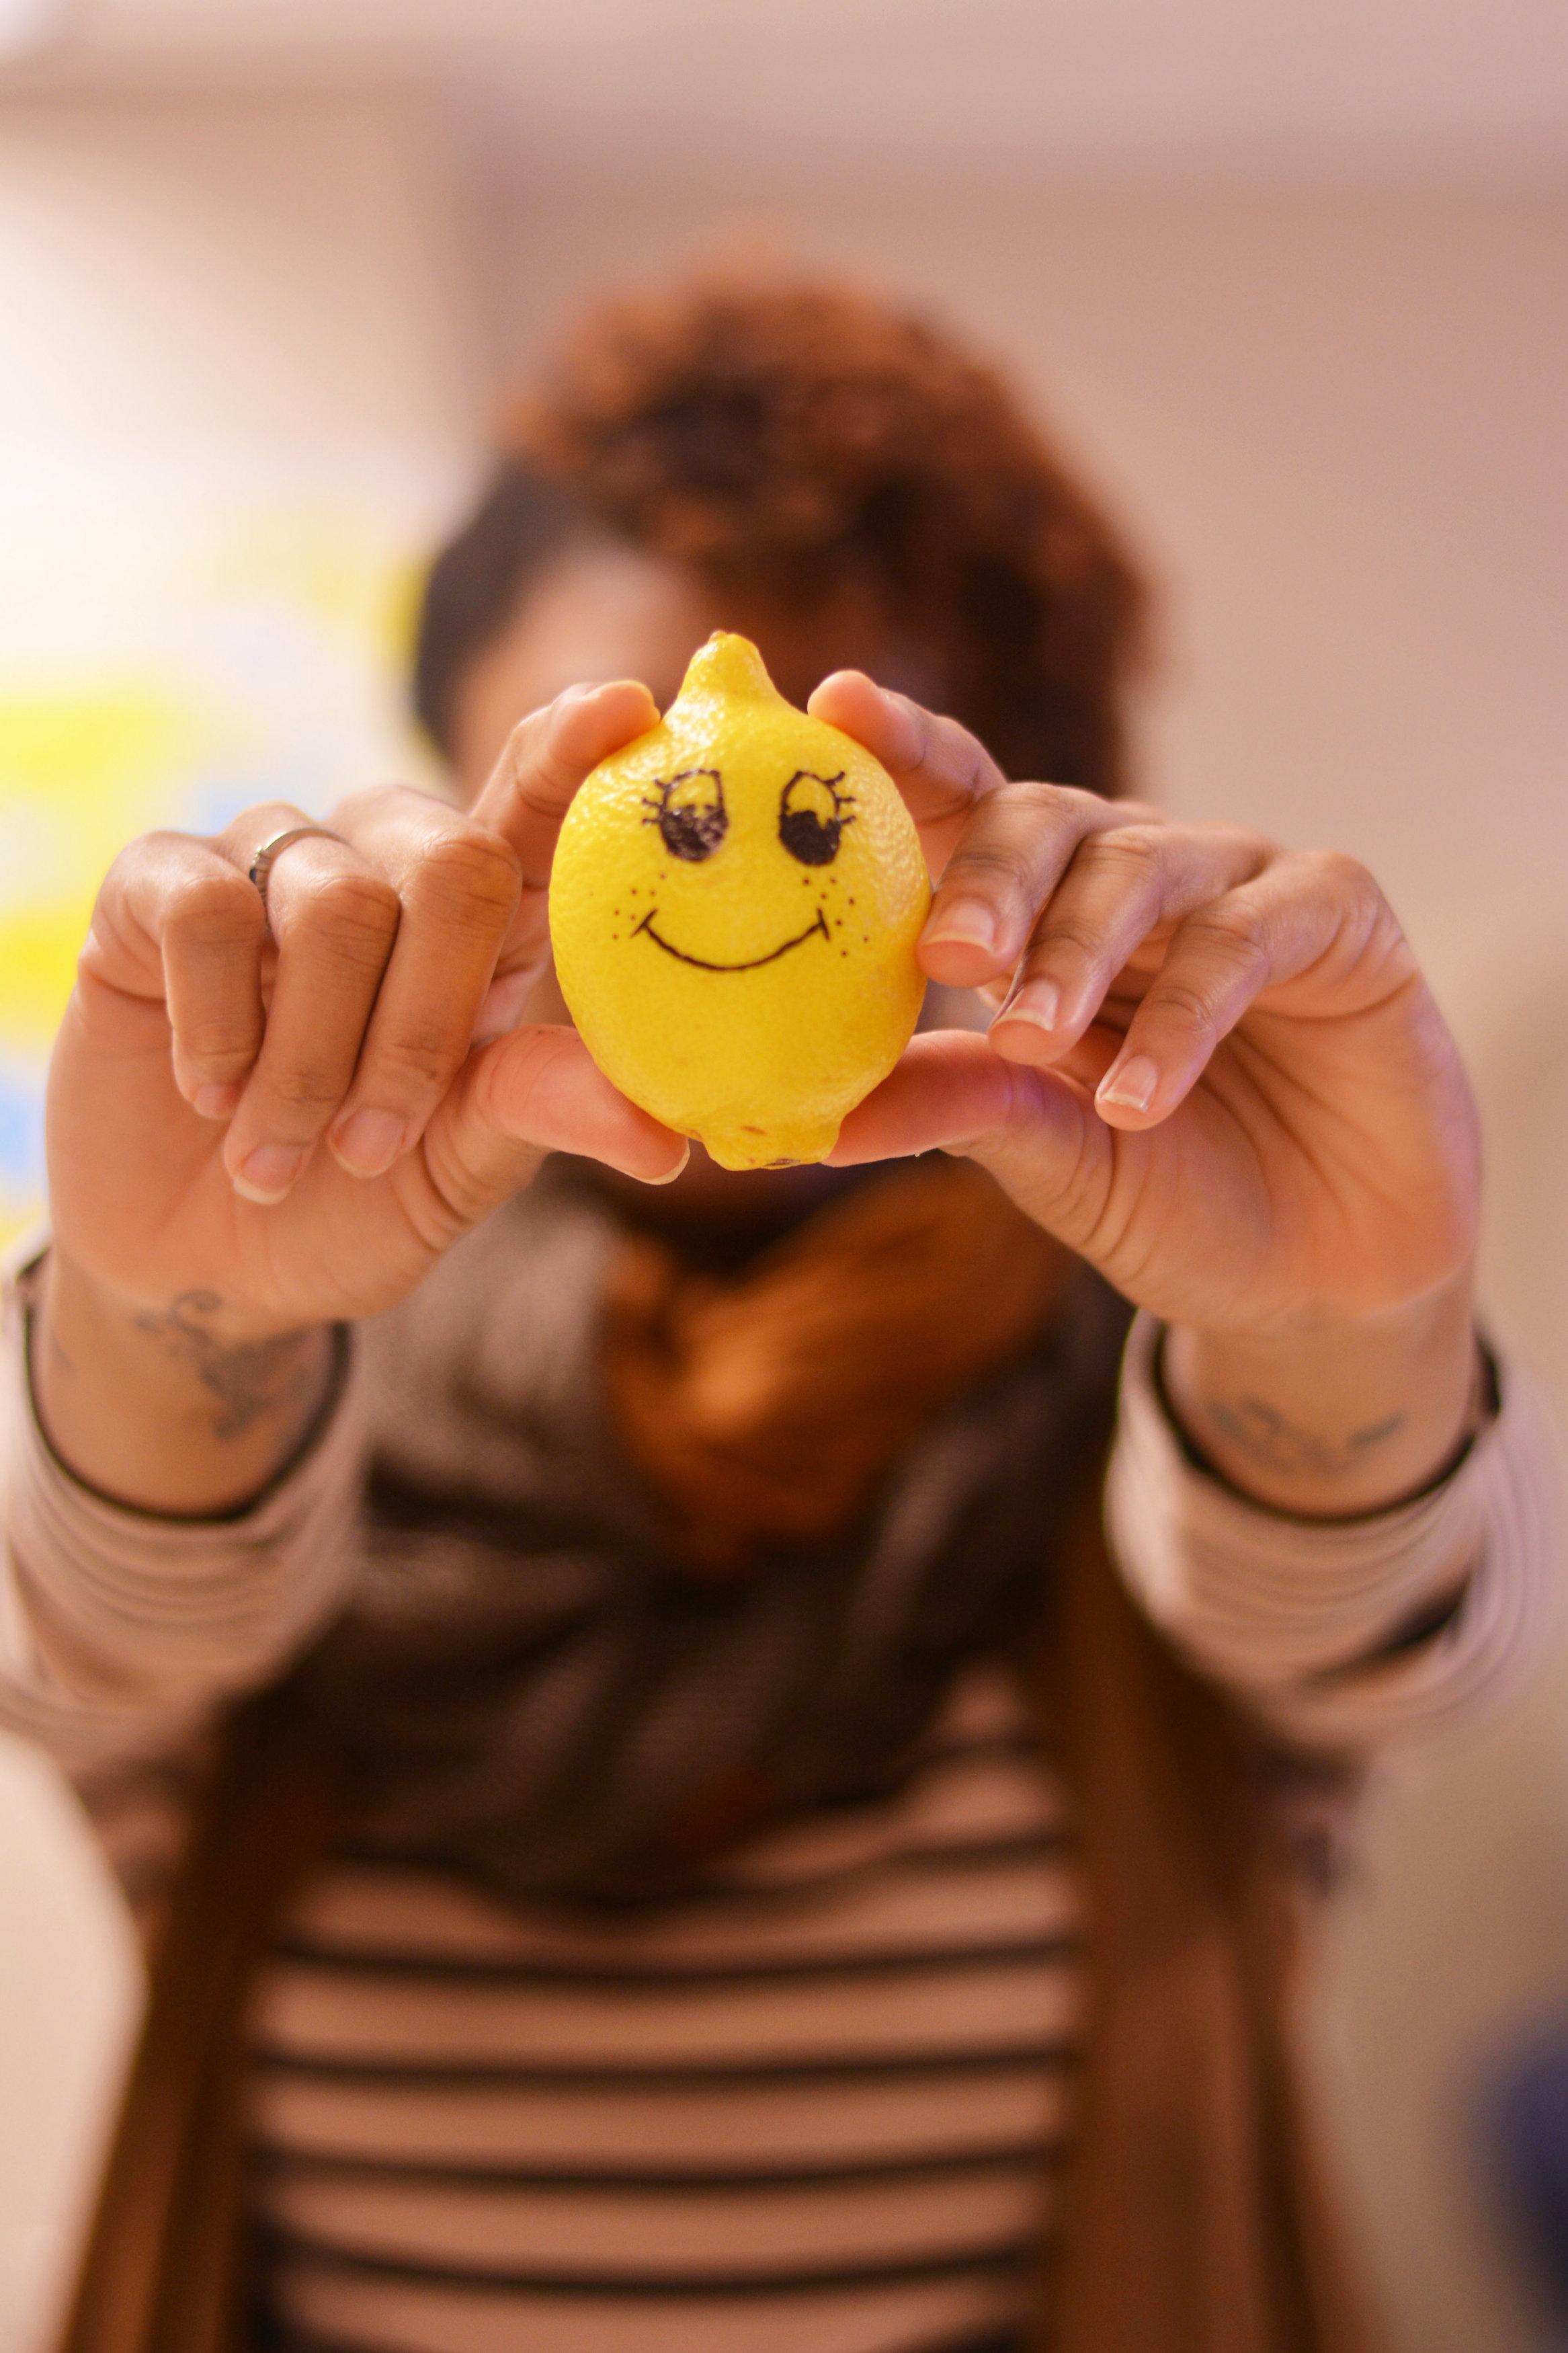 smiley-face-lemon-isha-gaines-createherstock.jpg